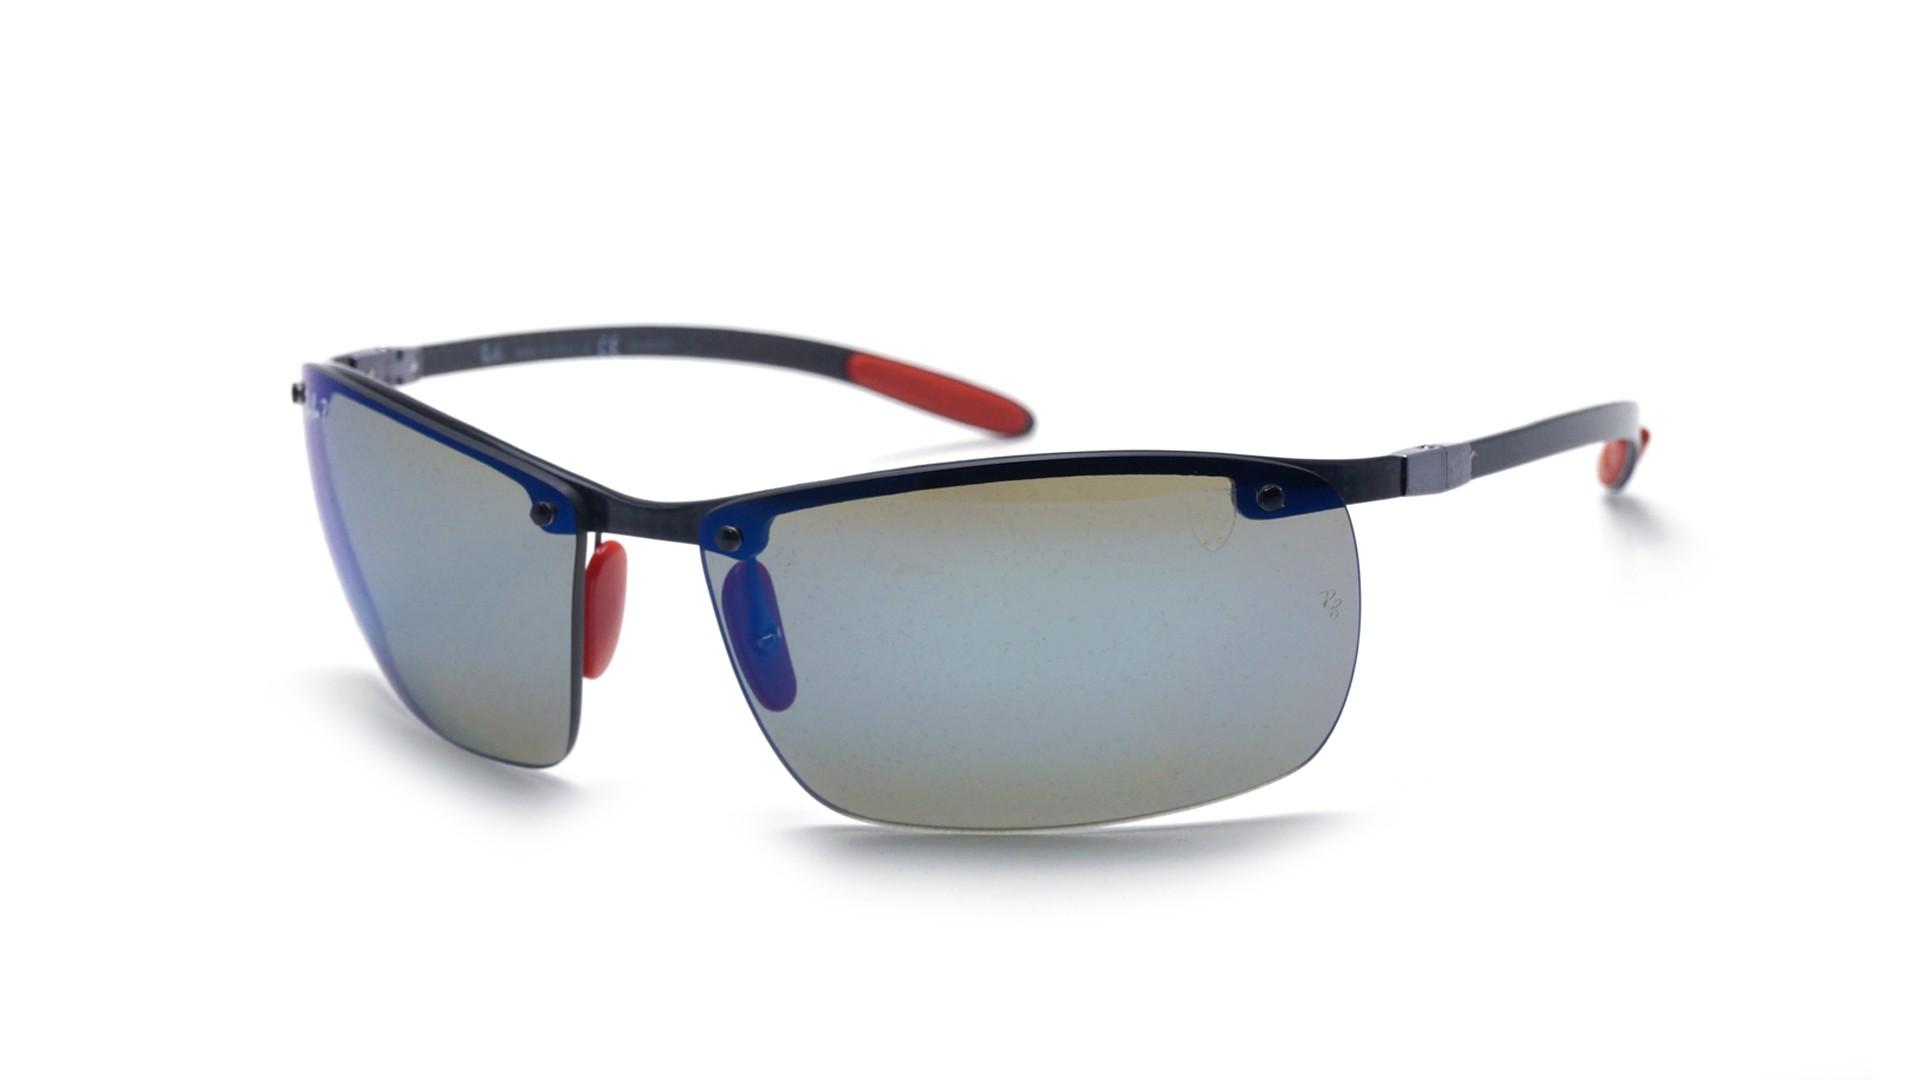 f9ee8d8020f0c Sunglasses Ray-Ban Fibre Carbon Scuderia Ferrari Grey RB8305M F005 H0 65-14  Large Polarized Flash